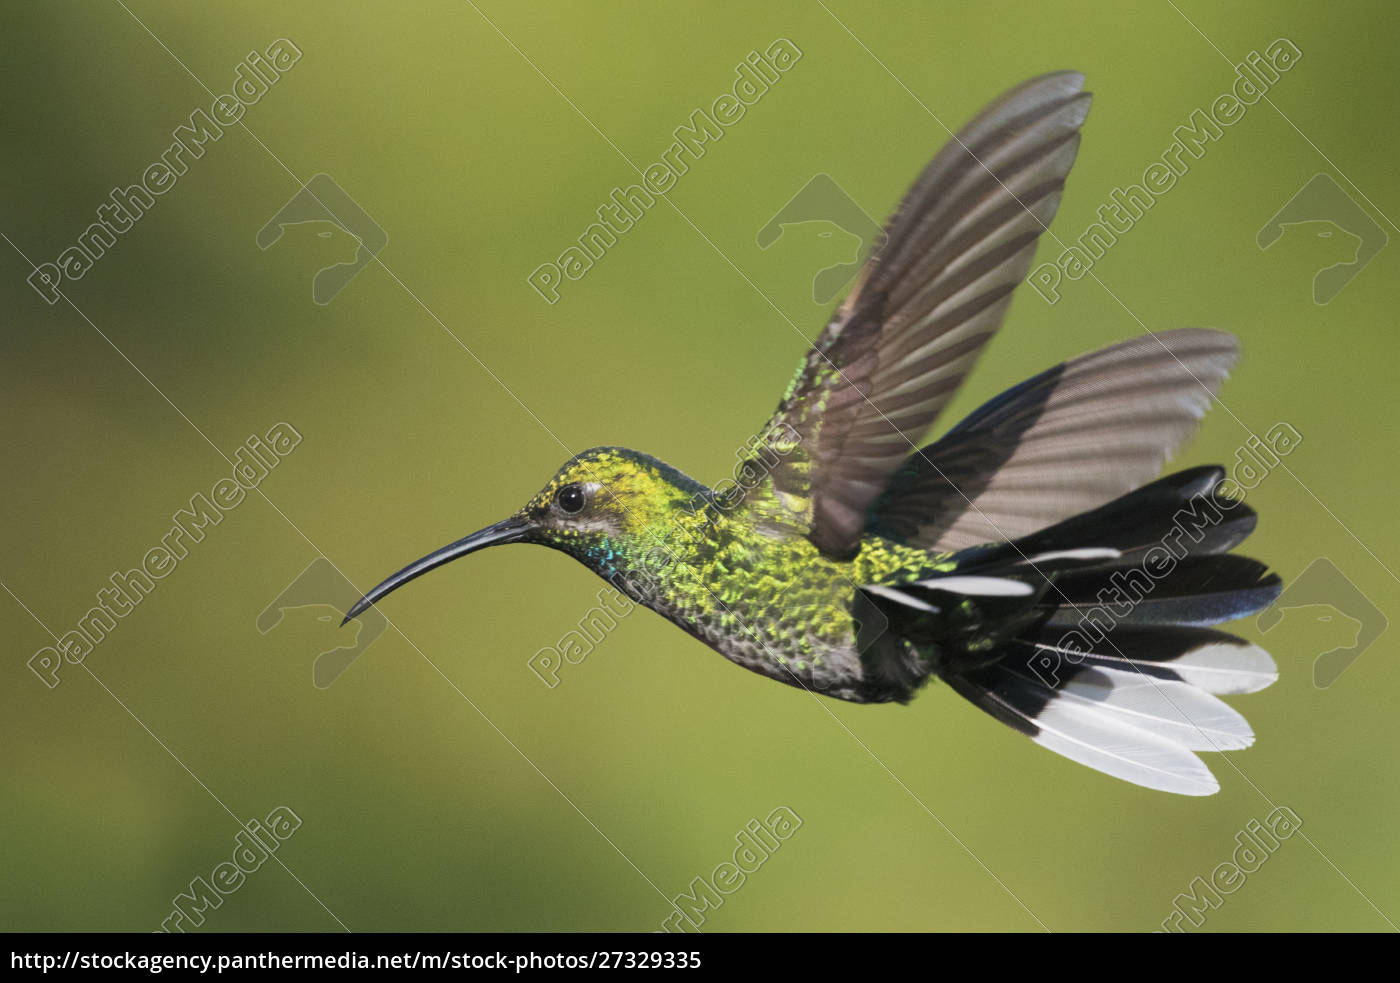 whitetailed, sabrewing, (campylopterus, ensipennis), fliegen, trinidad - 27329335